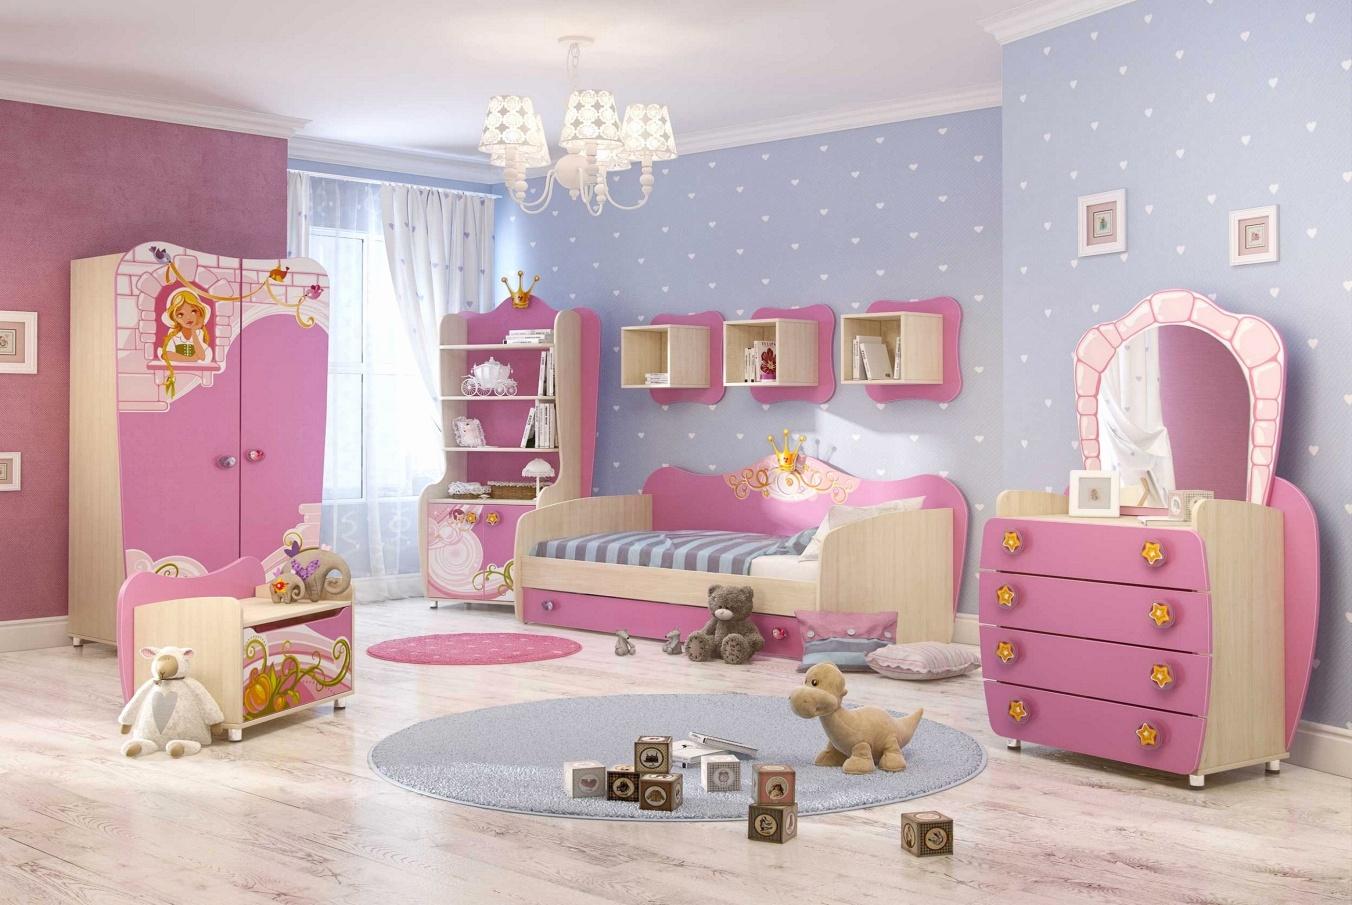 Bright lamps in toddler room - Taskmasters Dubai